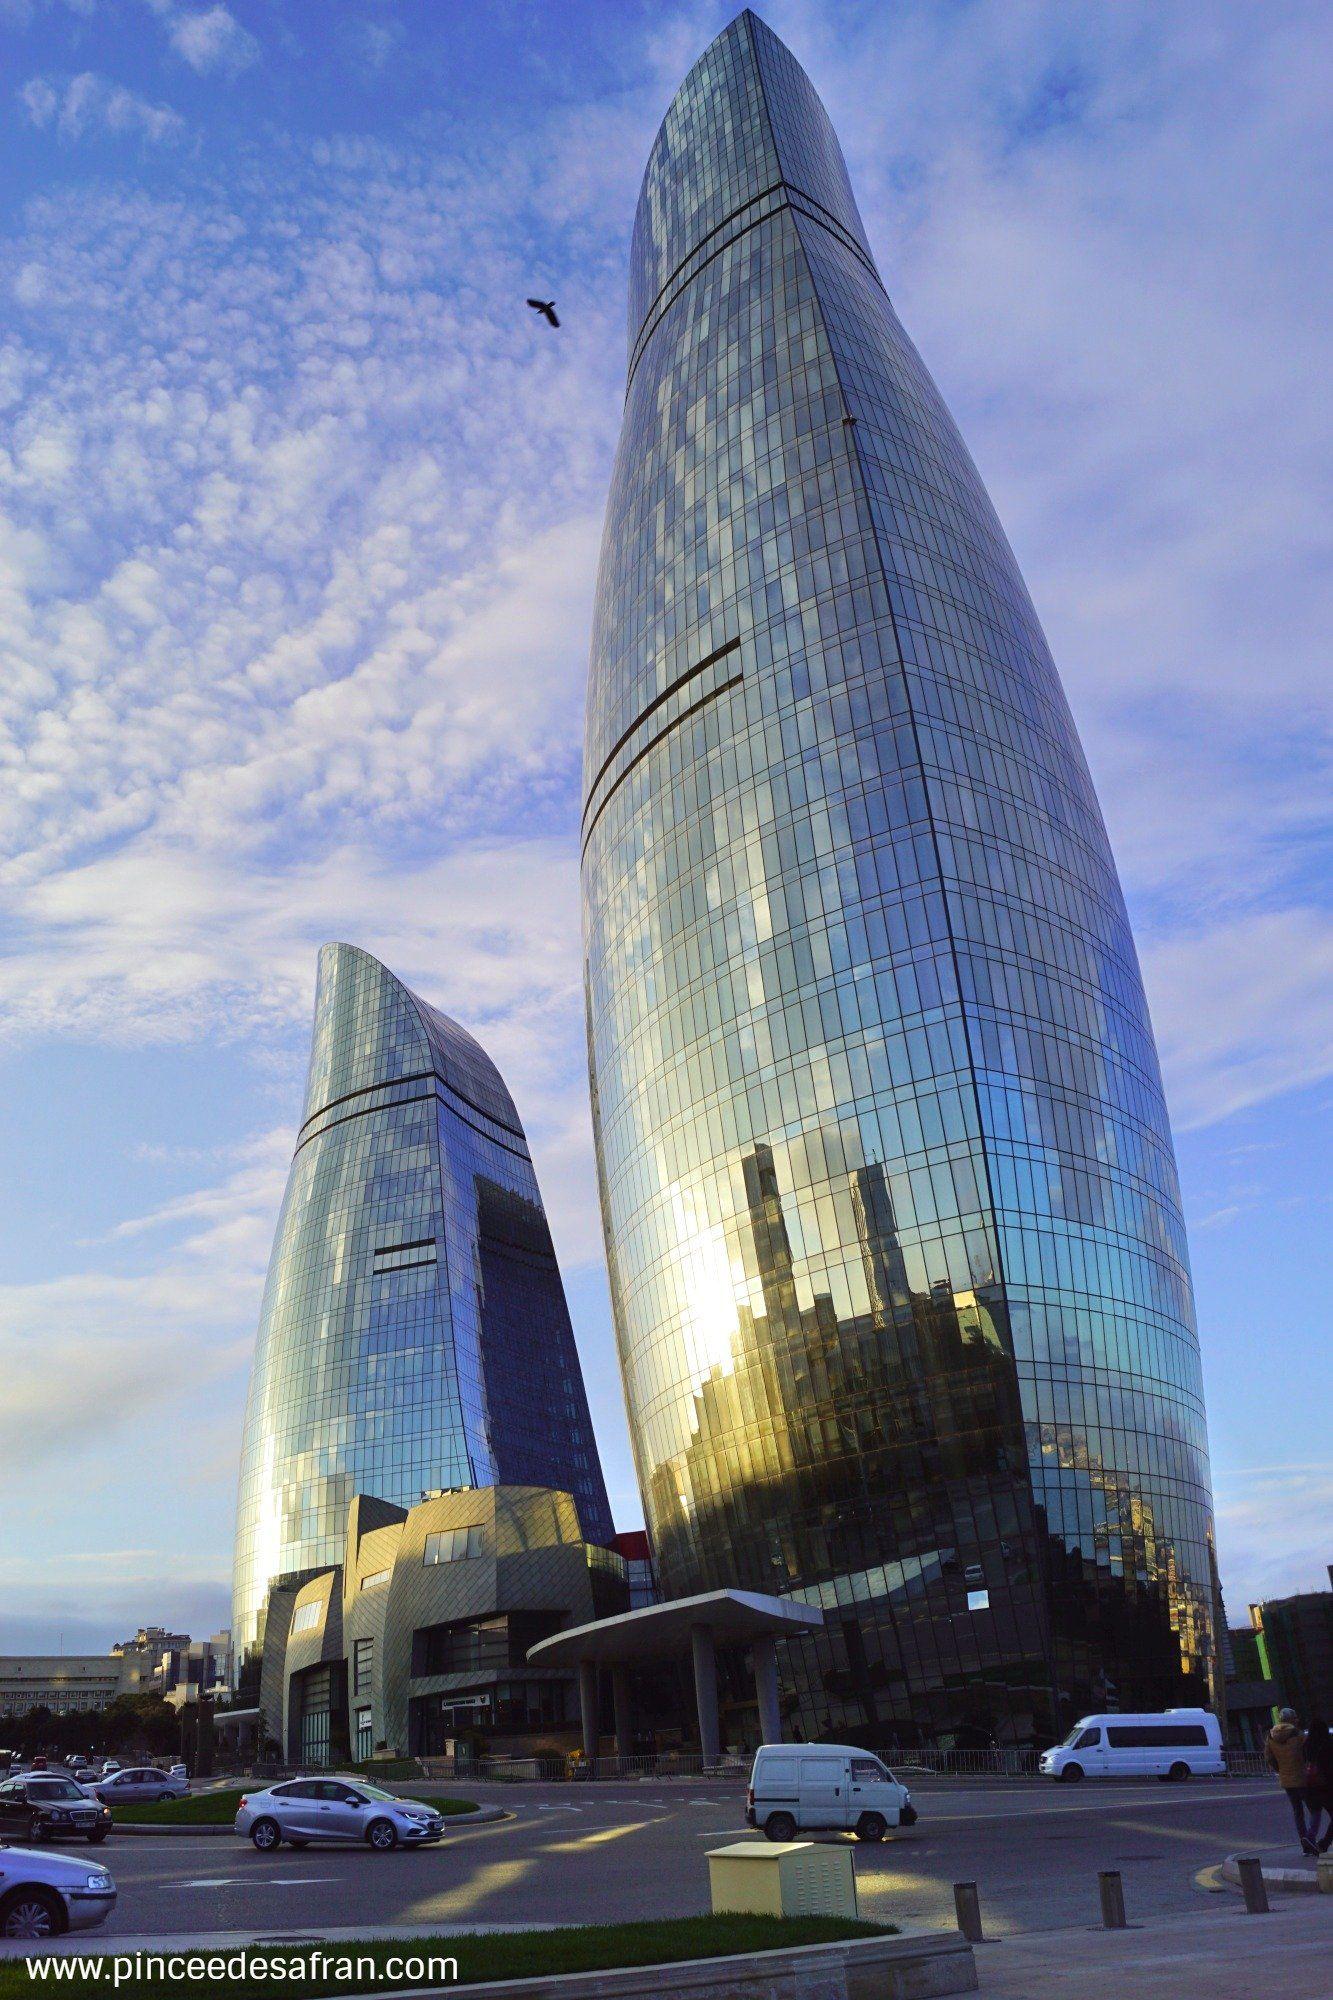 Azerbaidjan Notre City Guide Pour Visiter Baku Une Pincee De Safran Azerbaidjan Villes Du Monde Vieille Ville